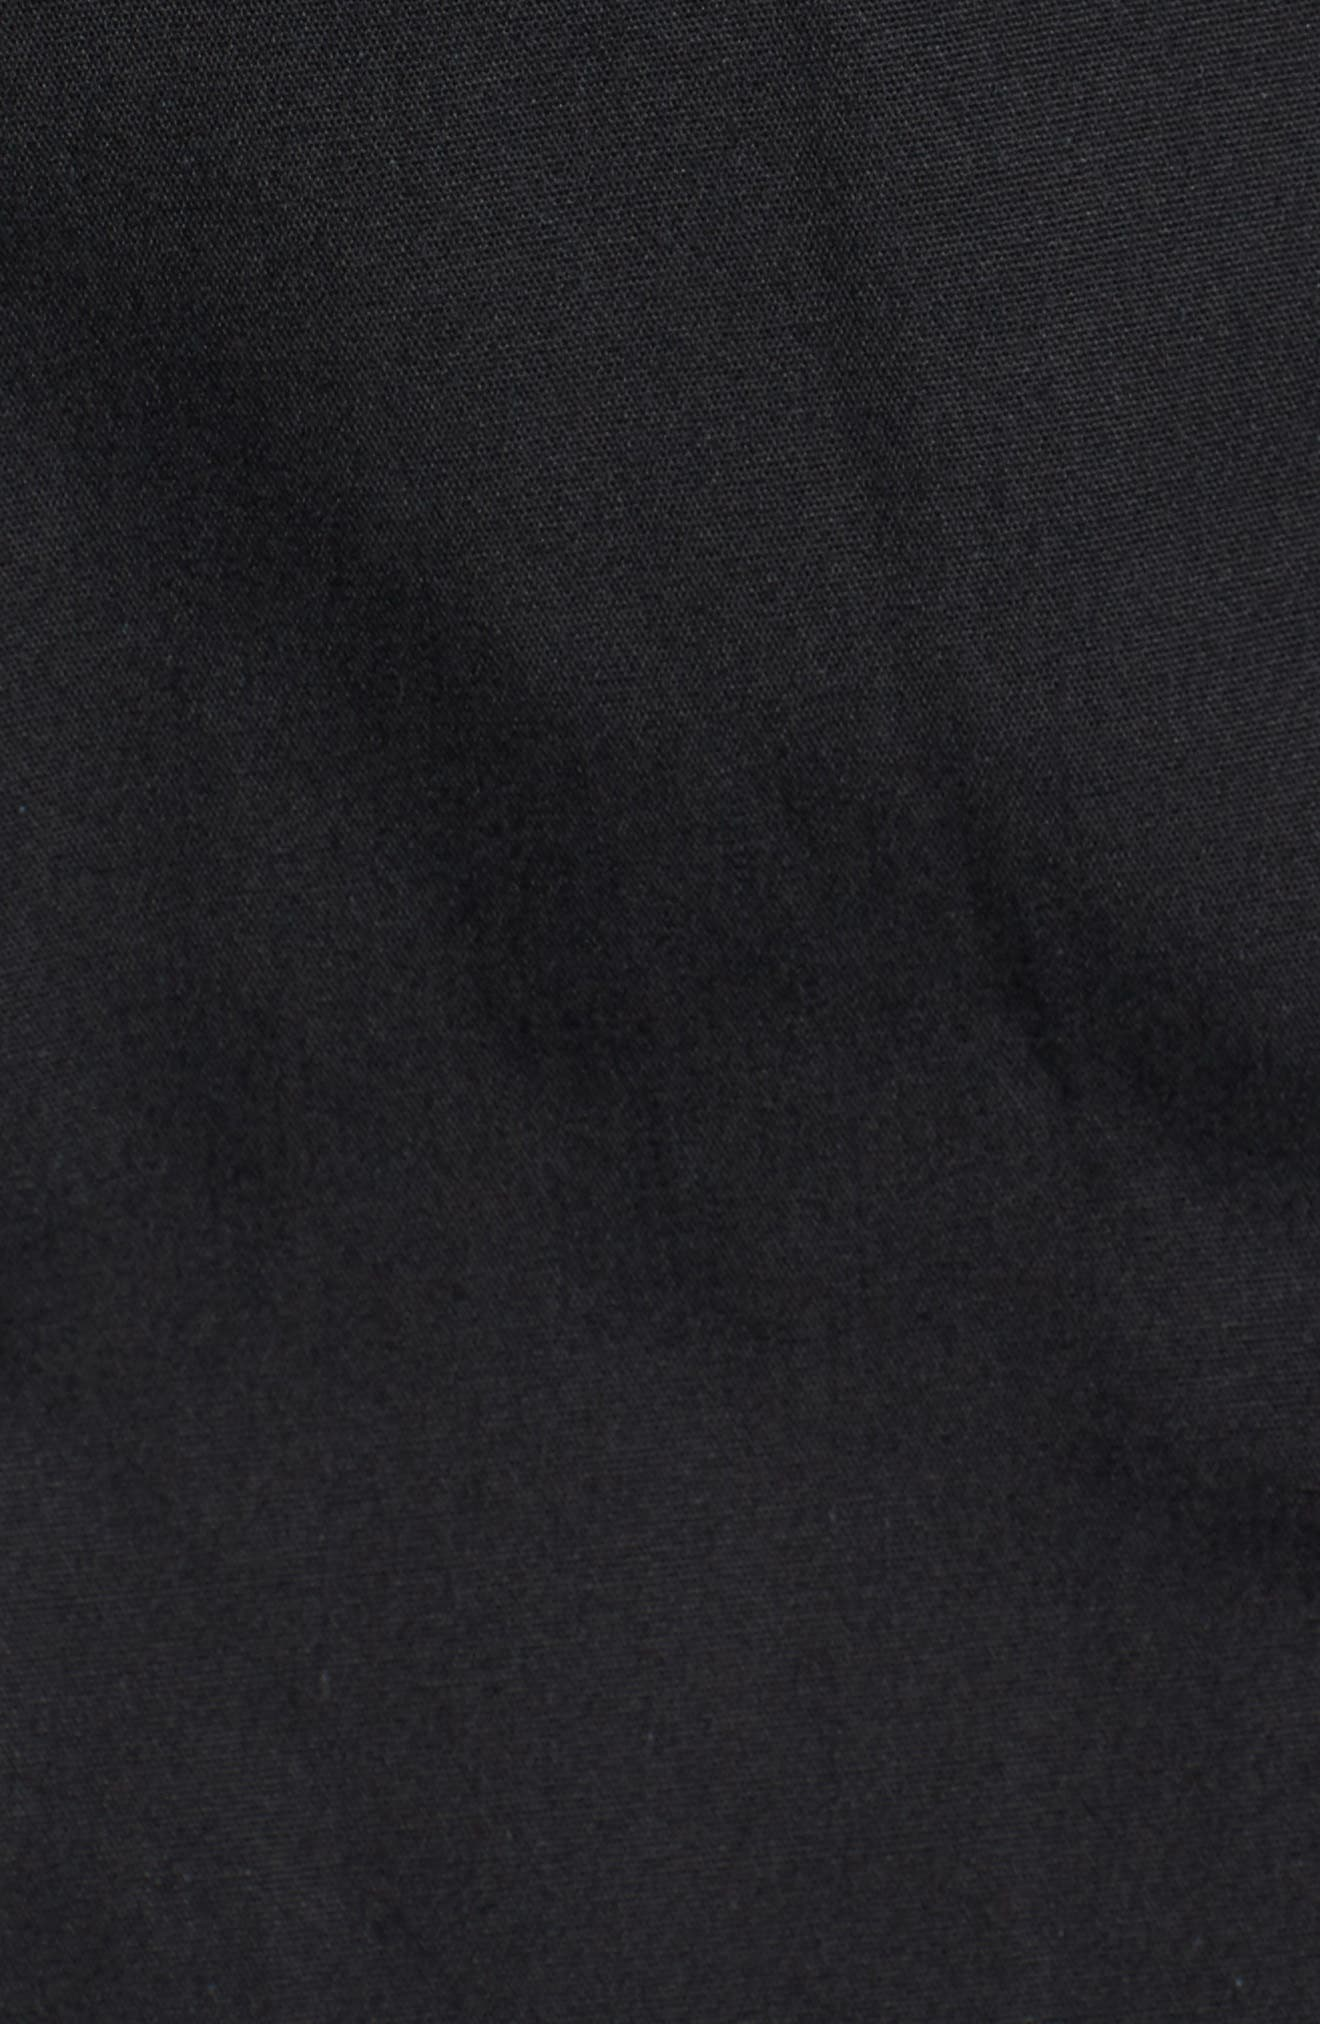 MODERN ETERNITY, Convertible Down 3-in-1 Maternity Jacket, Alternate thumbnail 5, color, BLACK